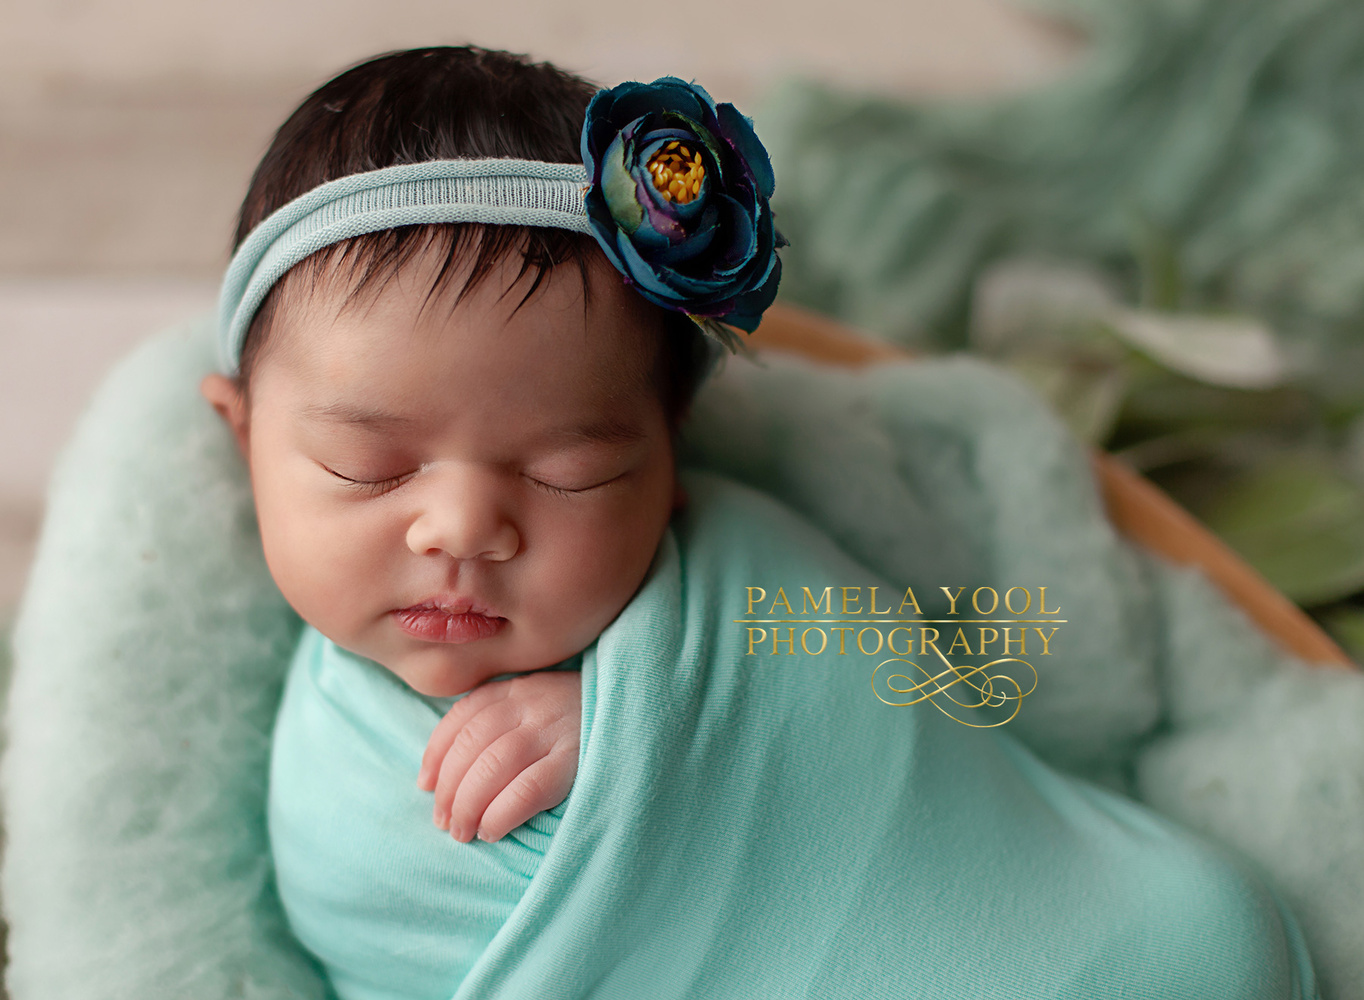 Newborn photography - Baby in Teal by Pamela Yool